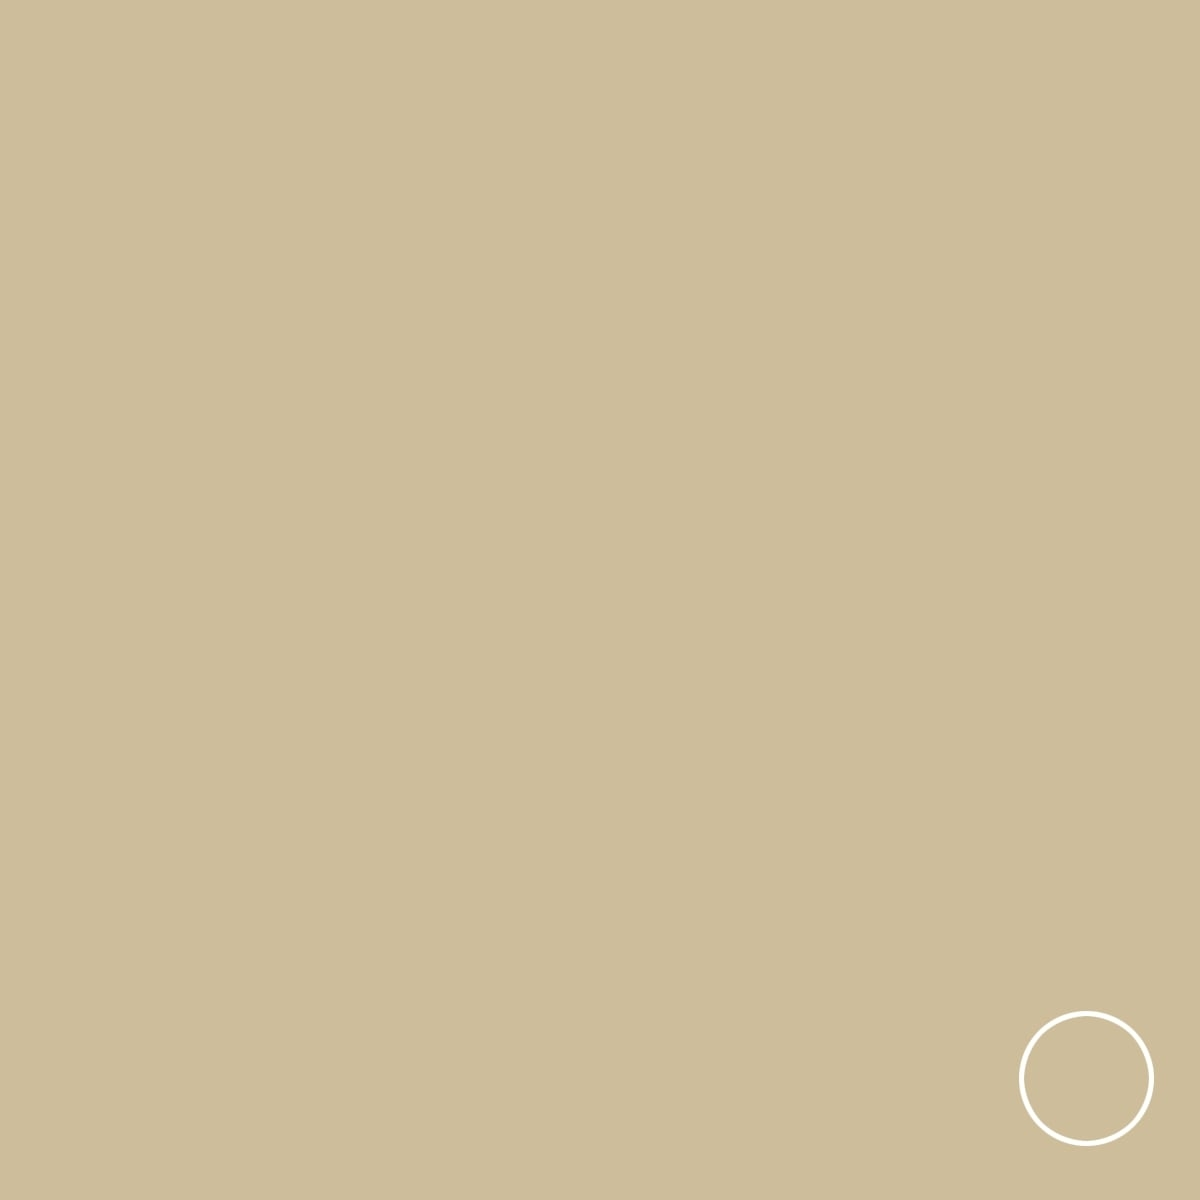 ORGANIC LINE (5ml)  - PIGMENT CAMOUFLAGE 40 ORGANICLINE AMIEA (5 ml)